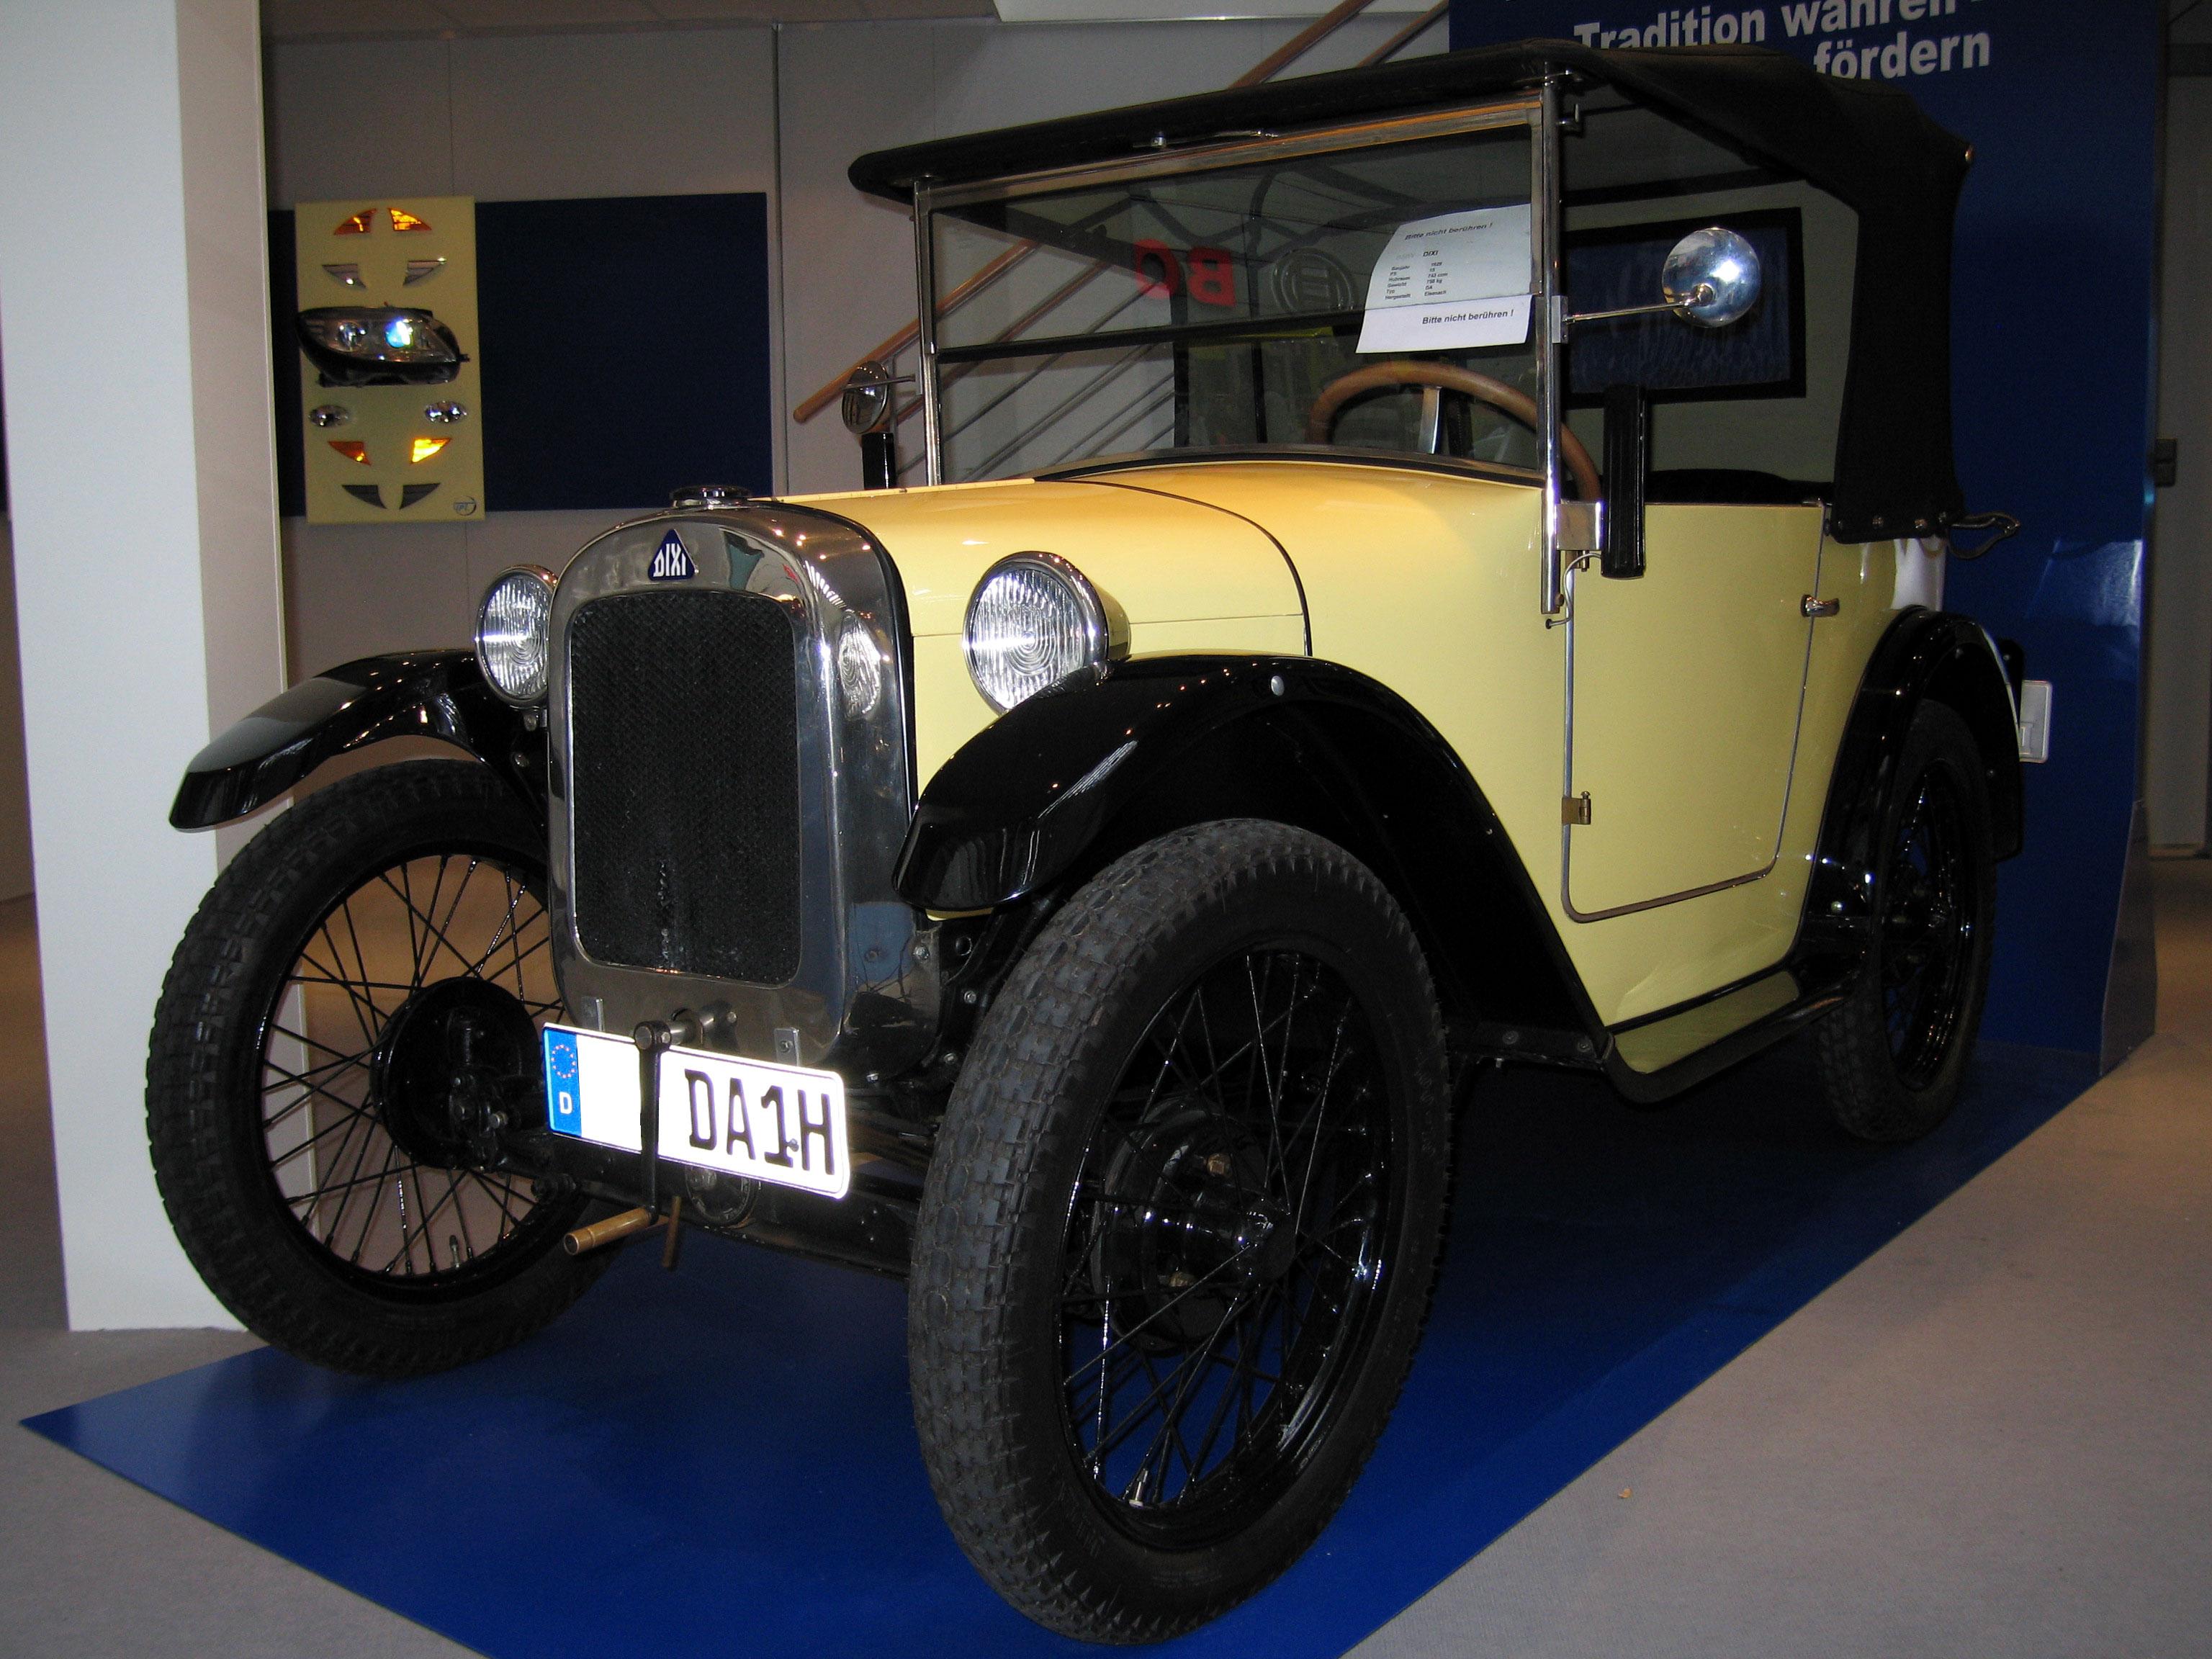 F10 M5 Car Blog: BMW V8 Engine History